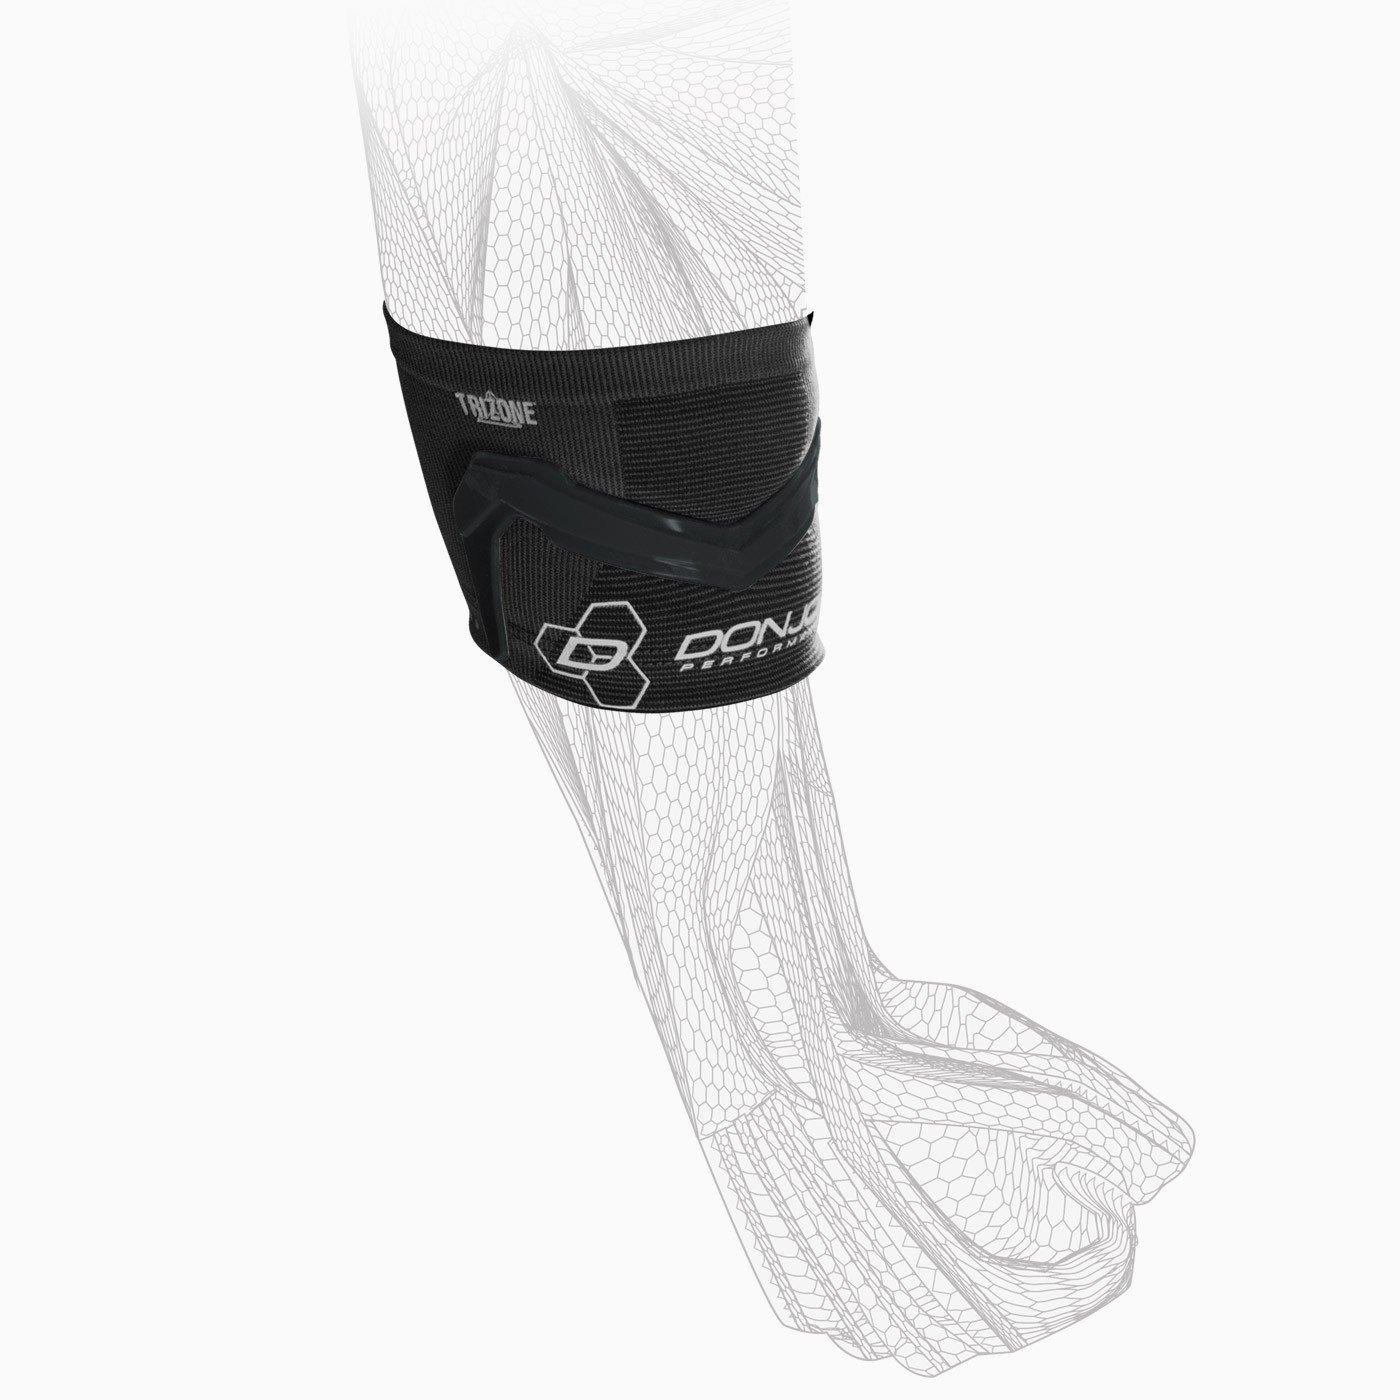 DonJoy Performance TRIZONE Compression Sleeve: Tennis/Golfers Elbow Support, Black, Medium by DonJoy Performance